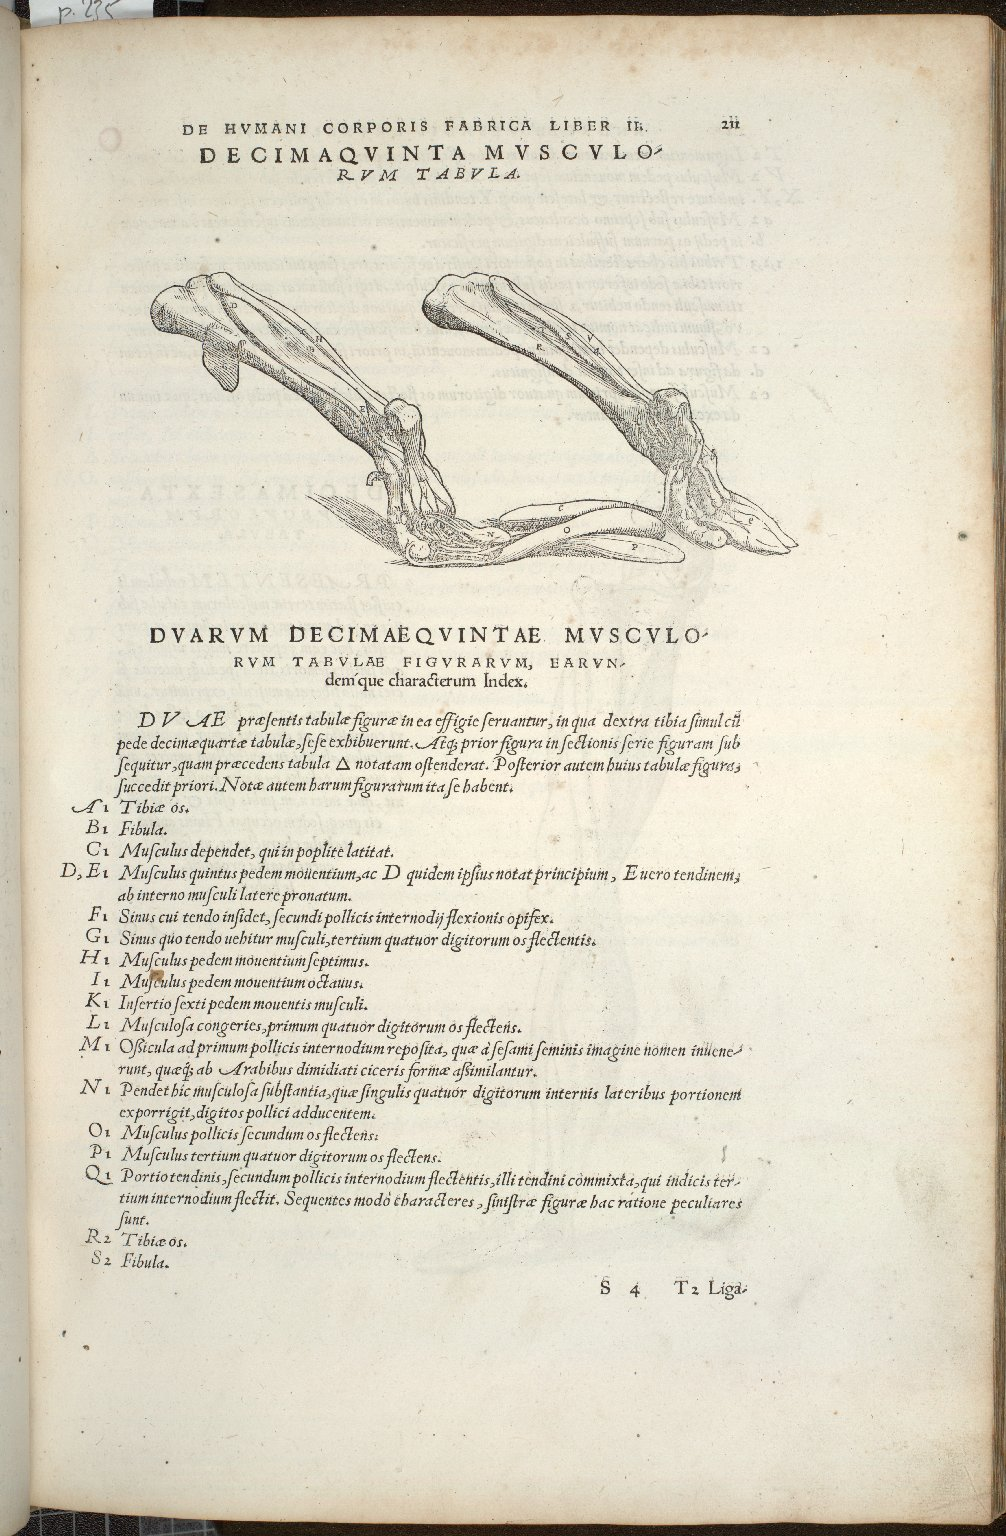 Decima Quinta Musculorum Tabula